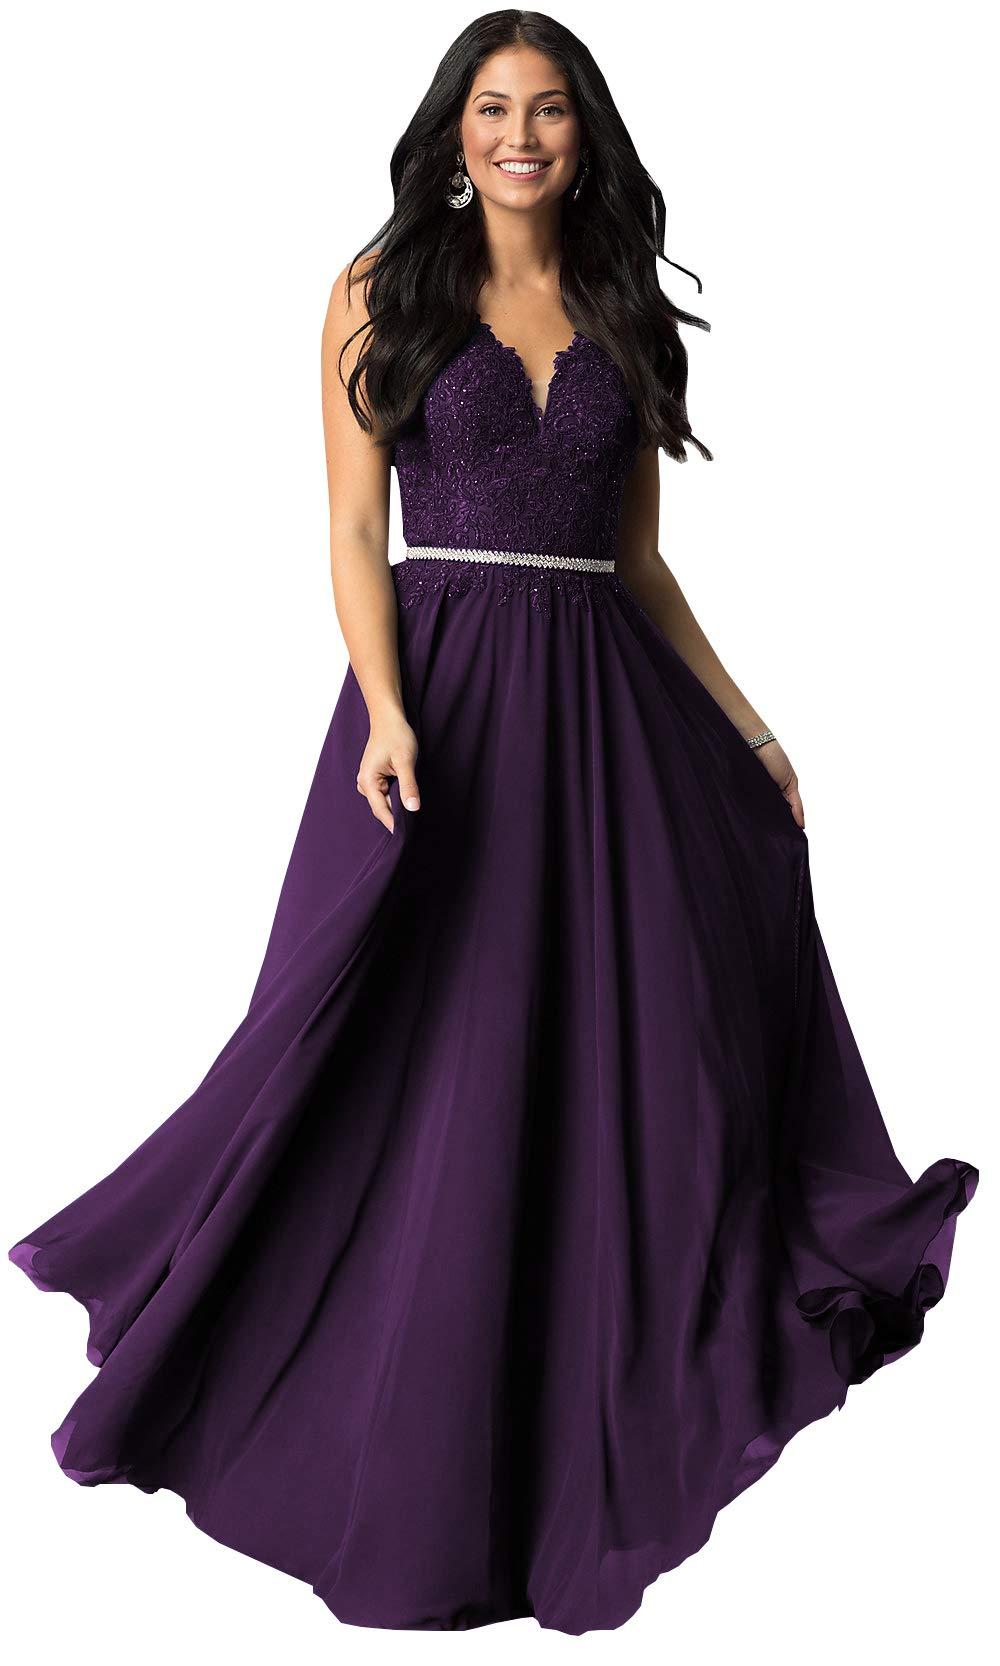 Prom Dresses for Women,Womens Sleeveless Formal Ladies Wedding Bridesmaid Lace Long Dress